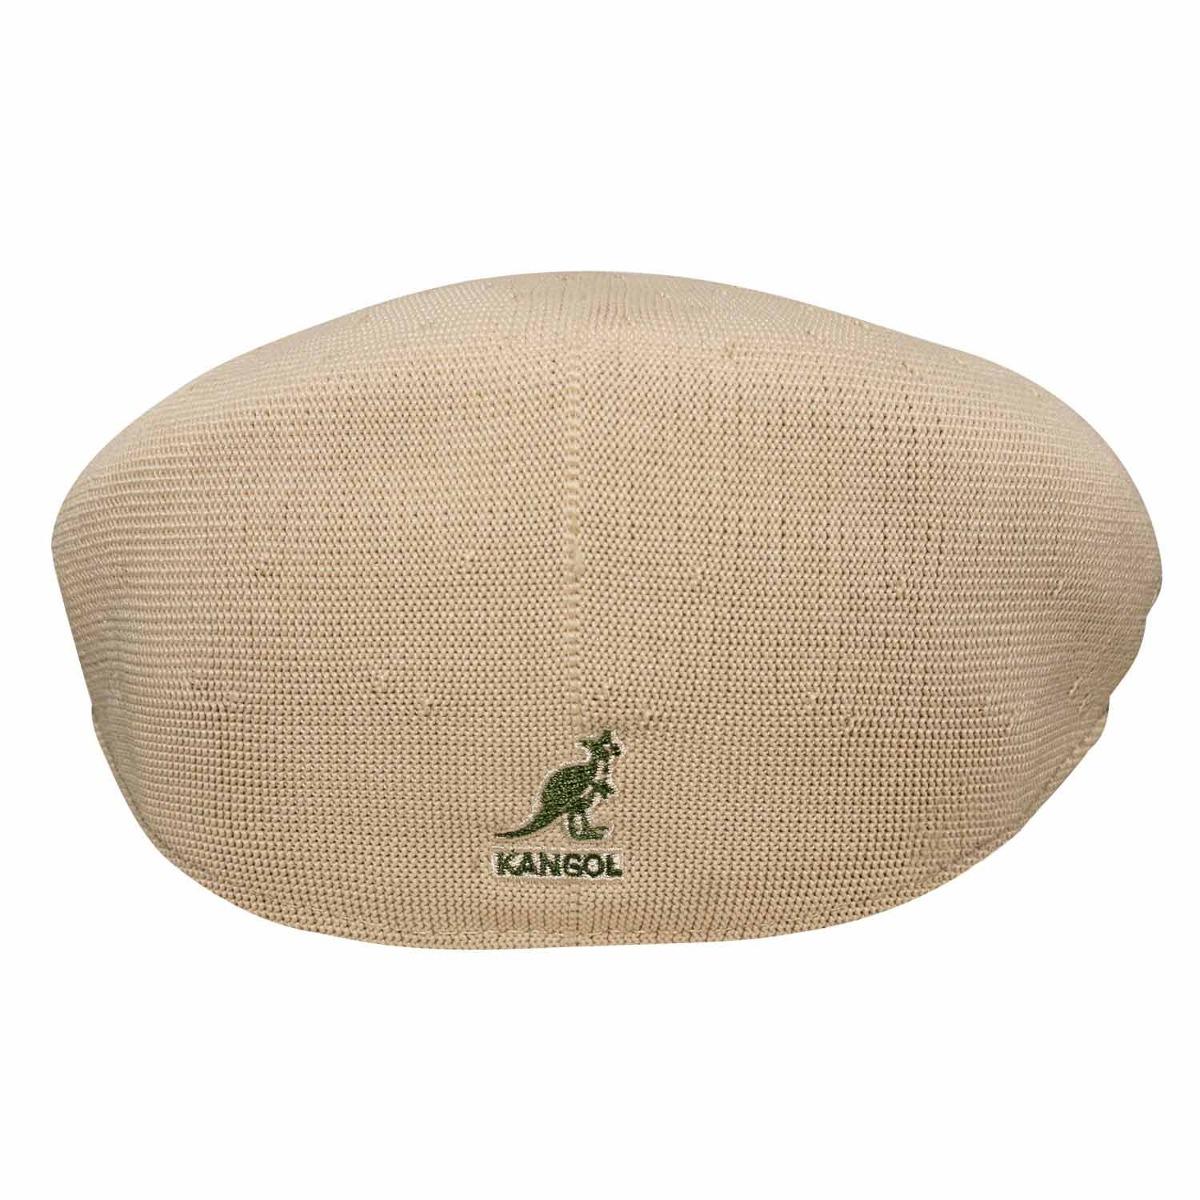 boina kangol tropic 504 -bege-tamanho 57 58. Carregando zoom. 9b6afff4f53